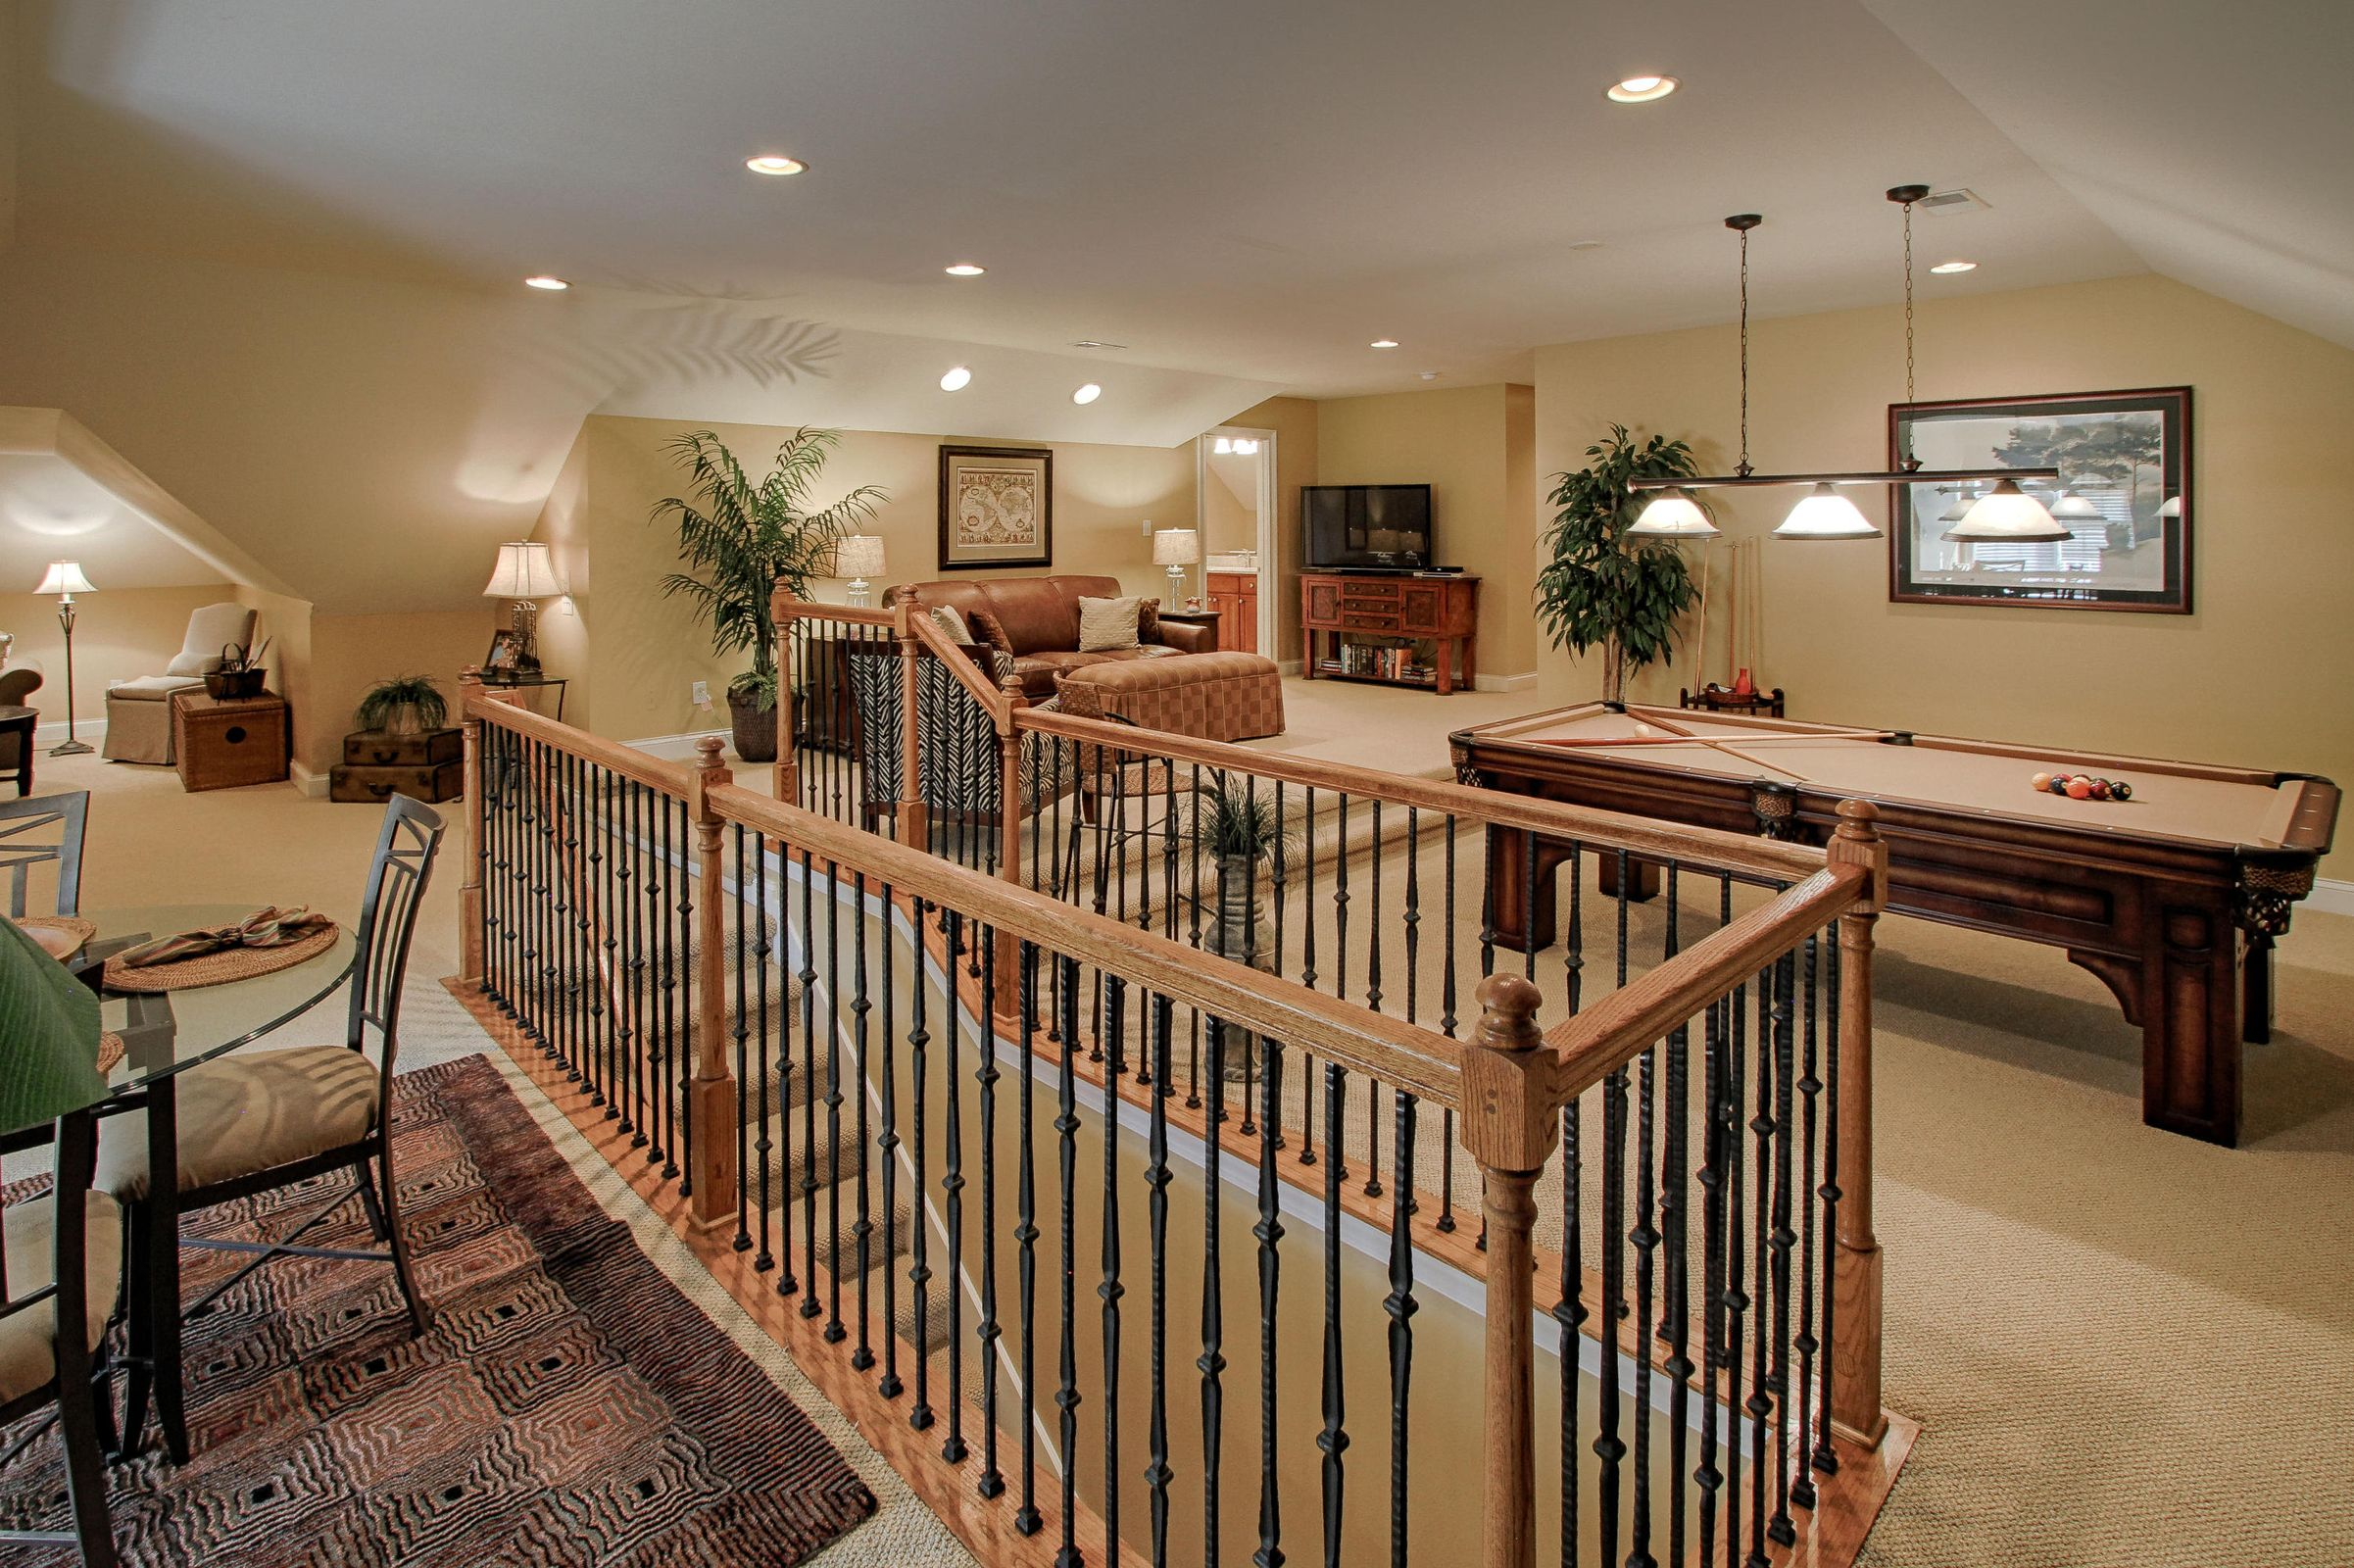 26 - Stairs in Bonus Room offer openess